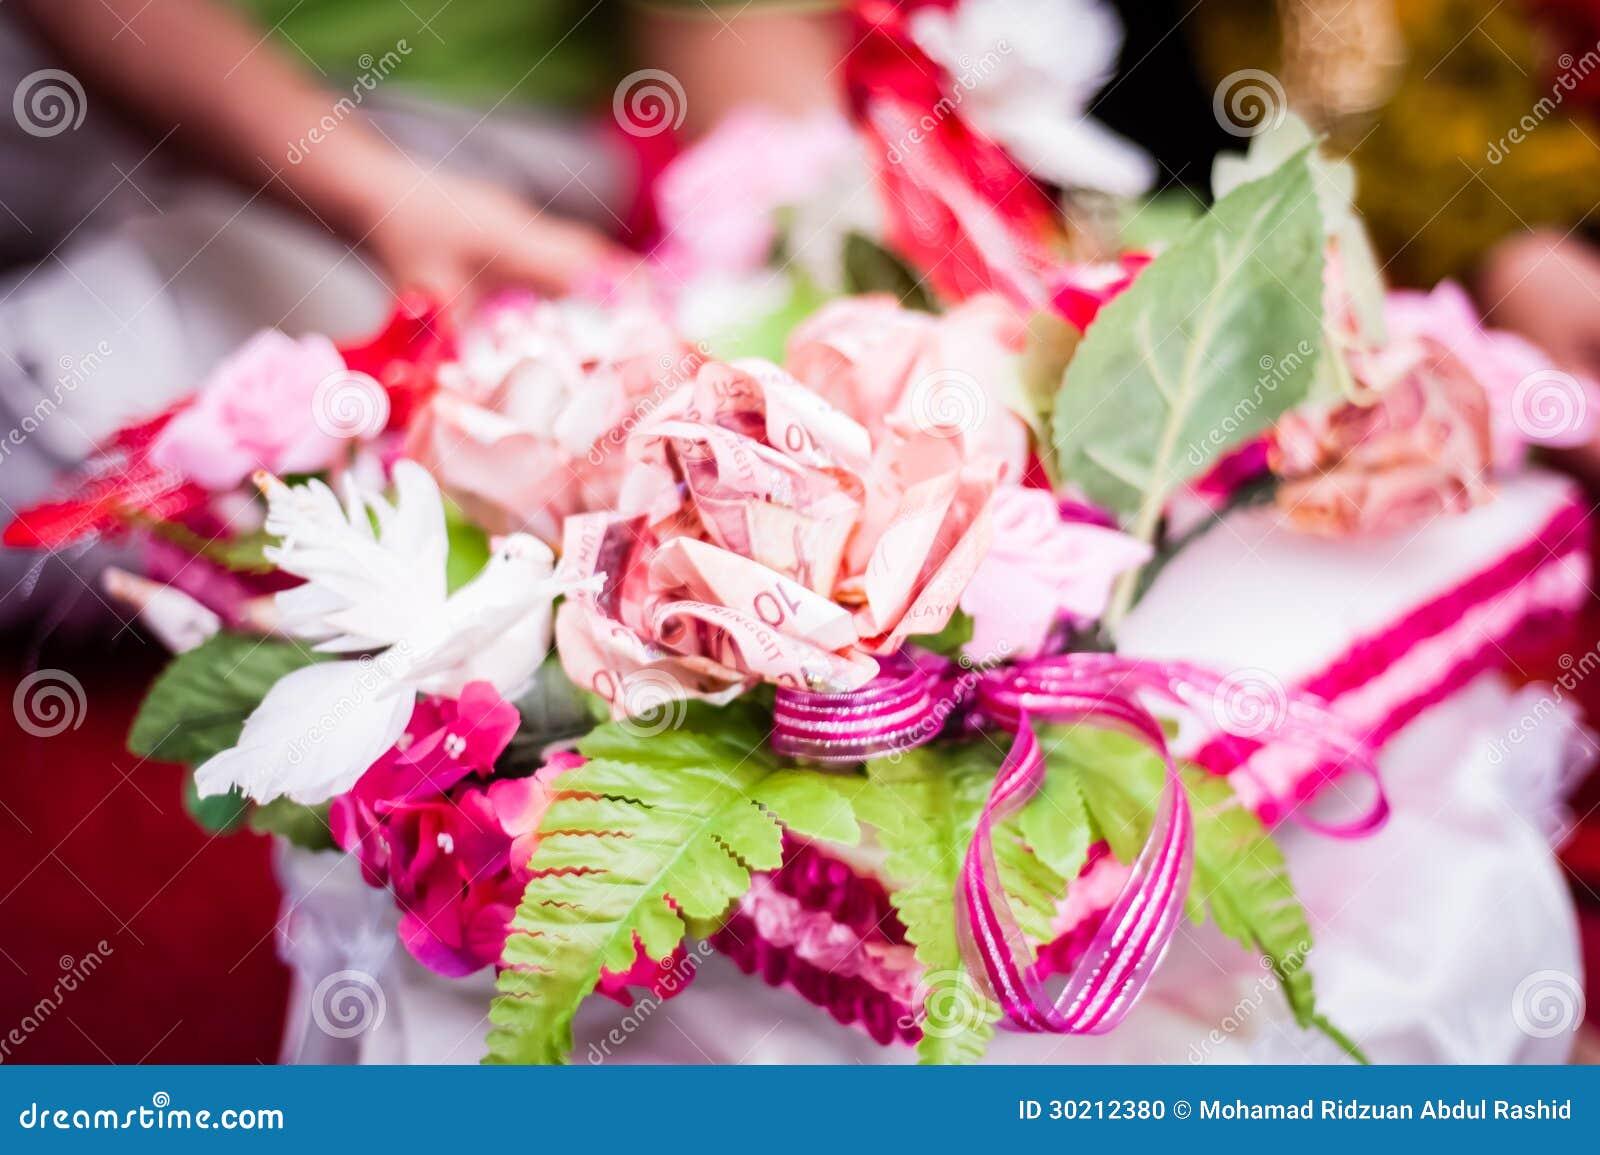 Wedding Gift Decoration : Wedding Gift Decoration Stock PhotoImage: 30212380